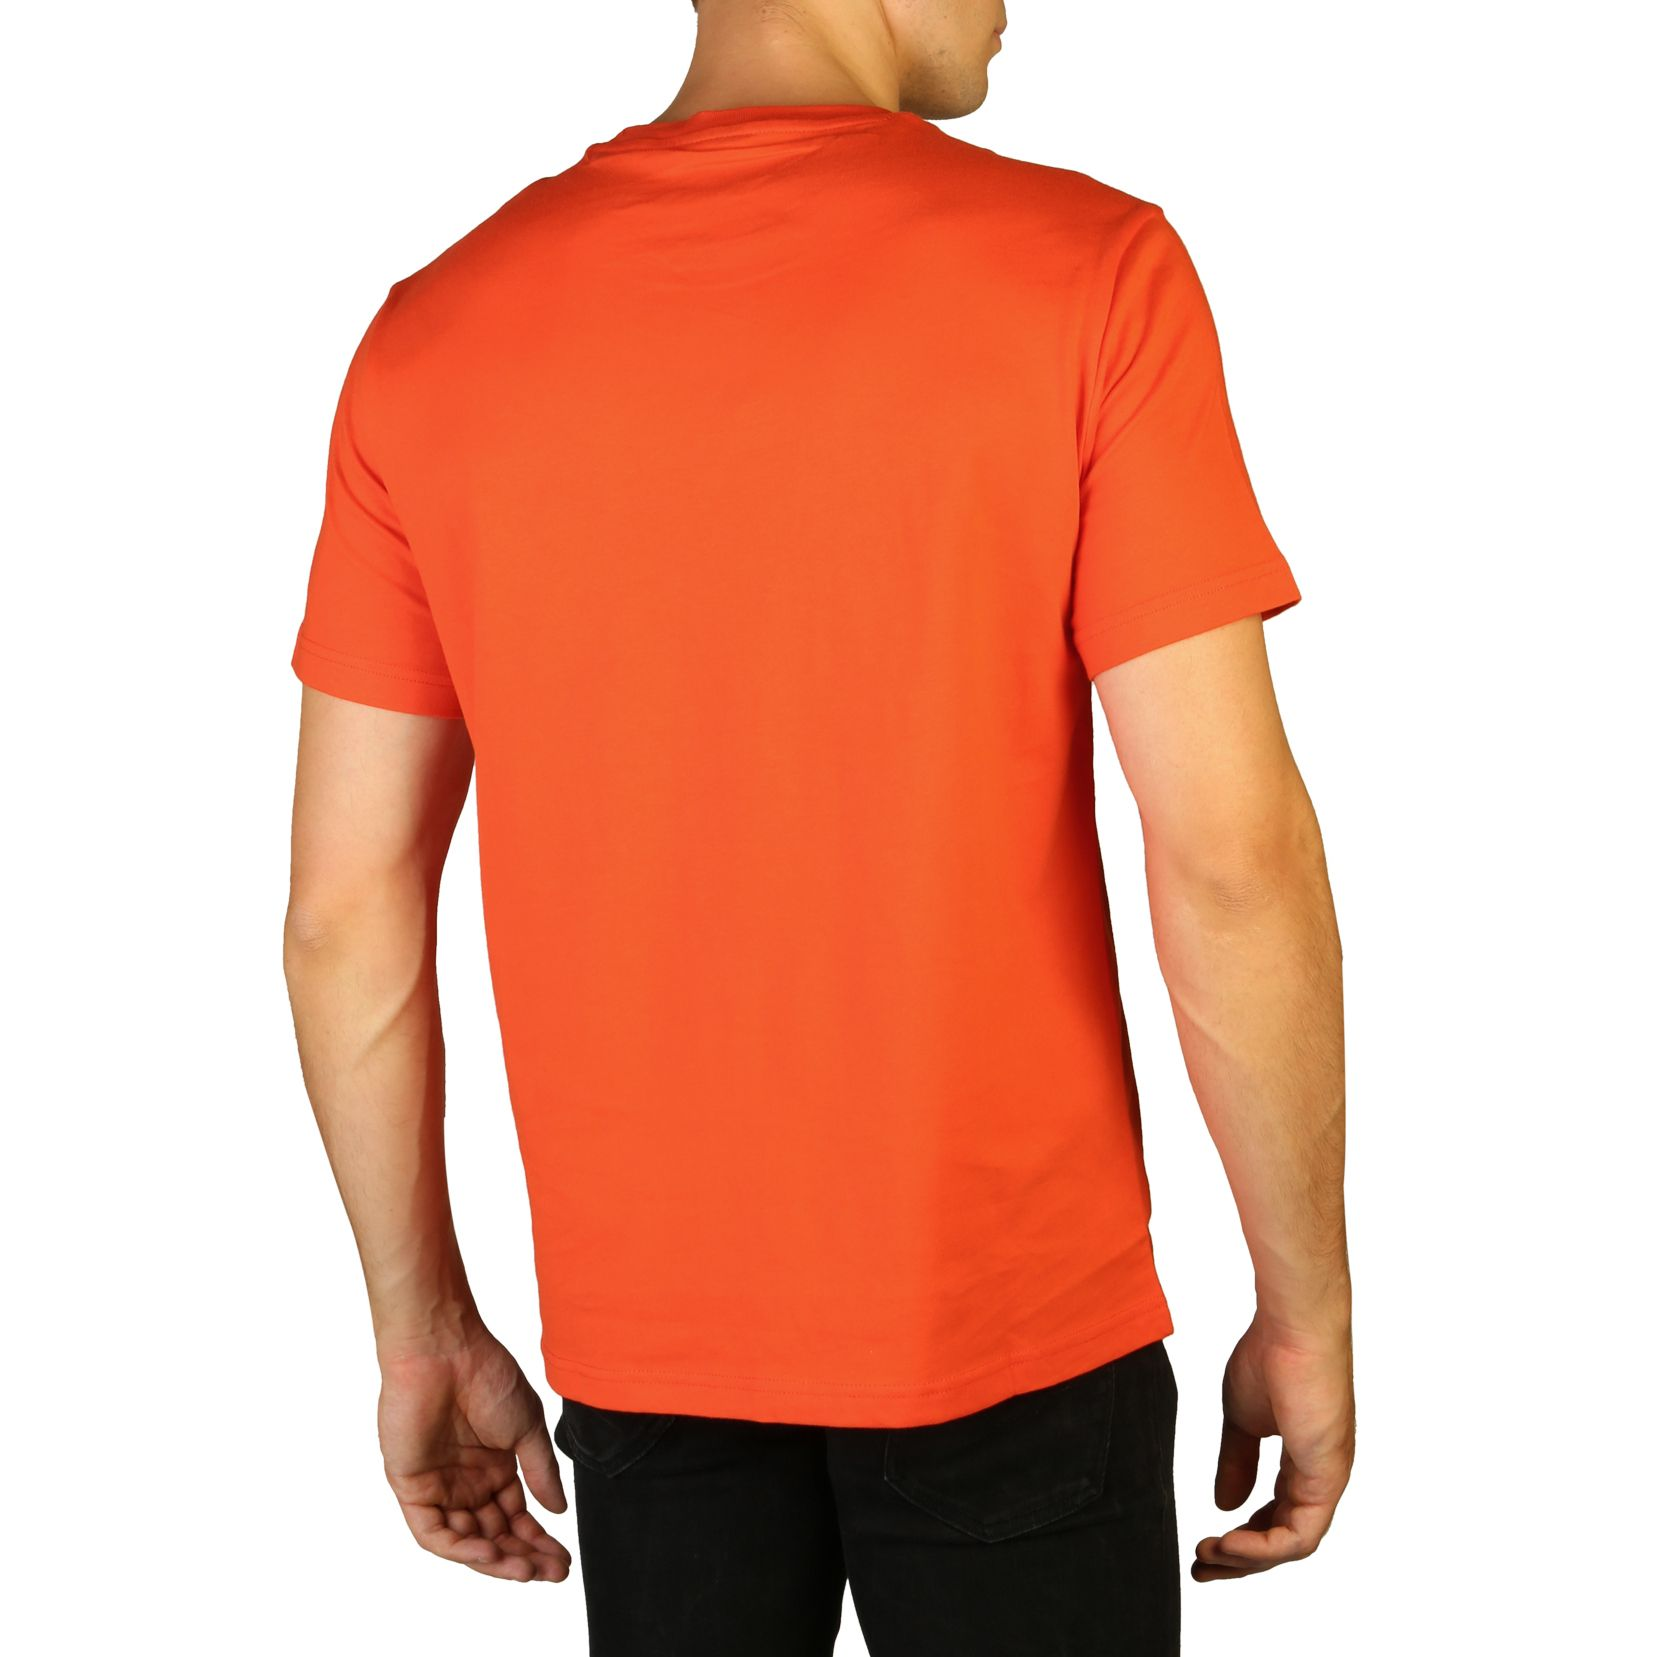 Champion – 214727 – Naranja